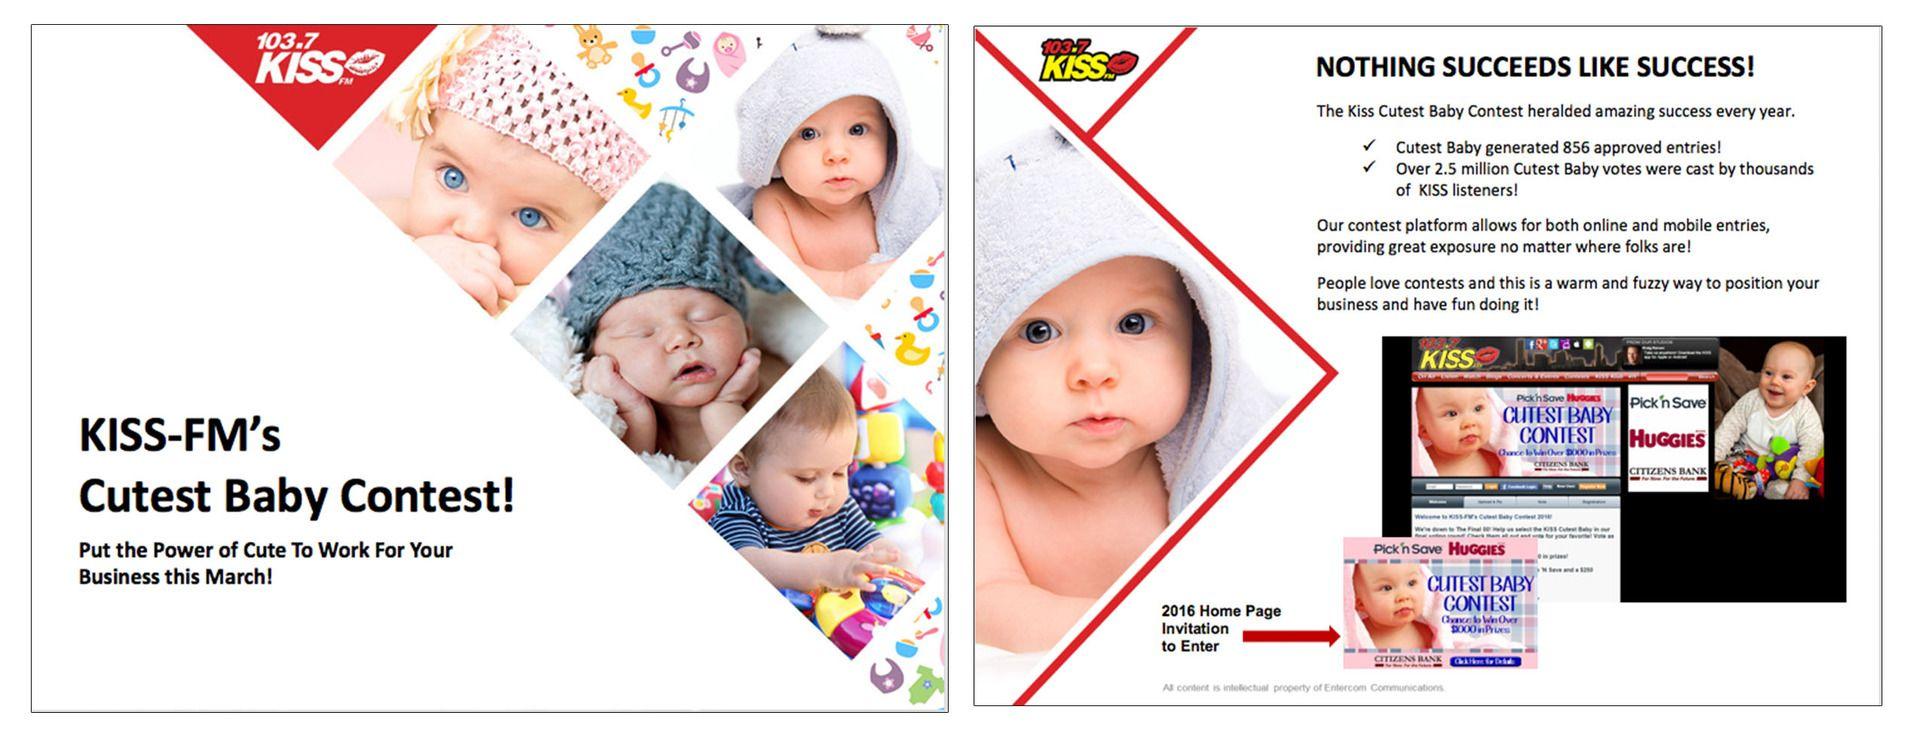 Powerpoint Slide Presentation Wxss 103 7 Milwaukee Kiss Fm